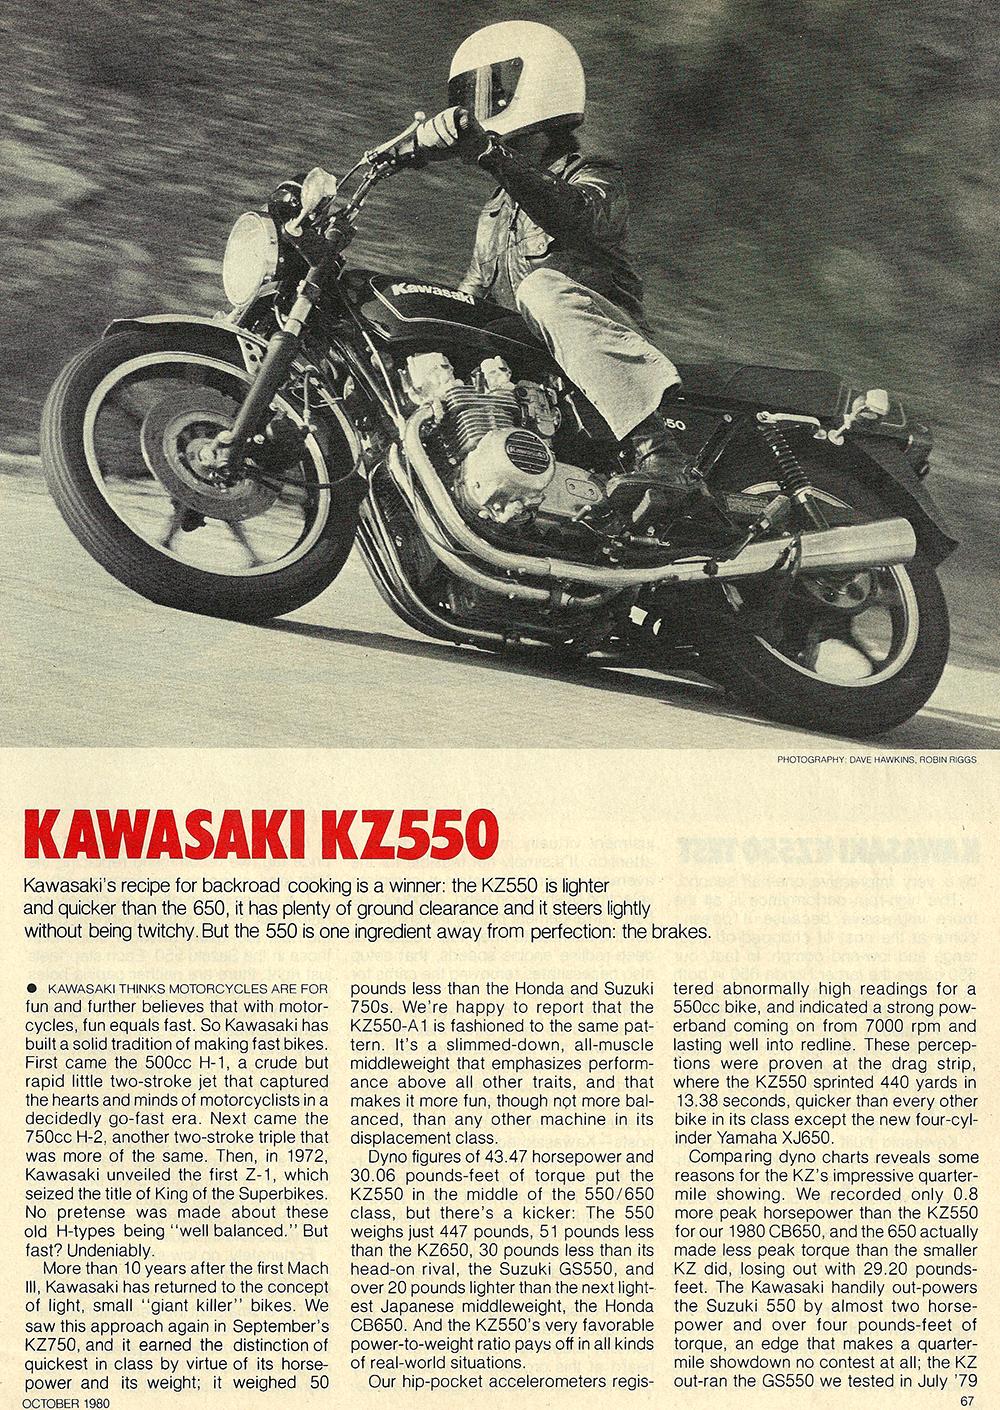 1980 Kawasaki KZ550 road test 01.jpg